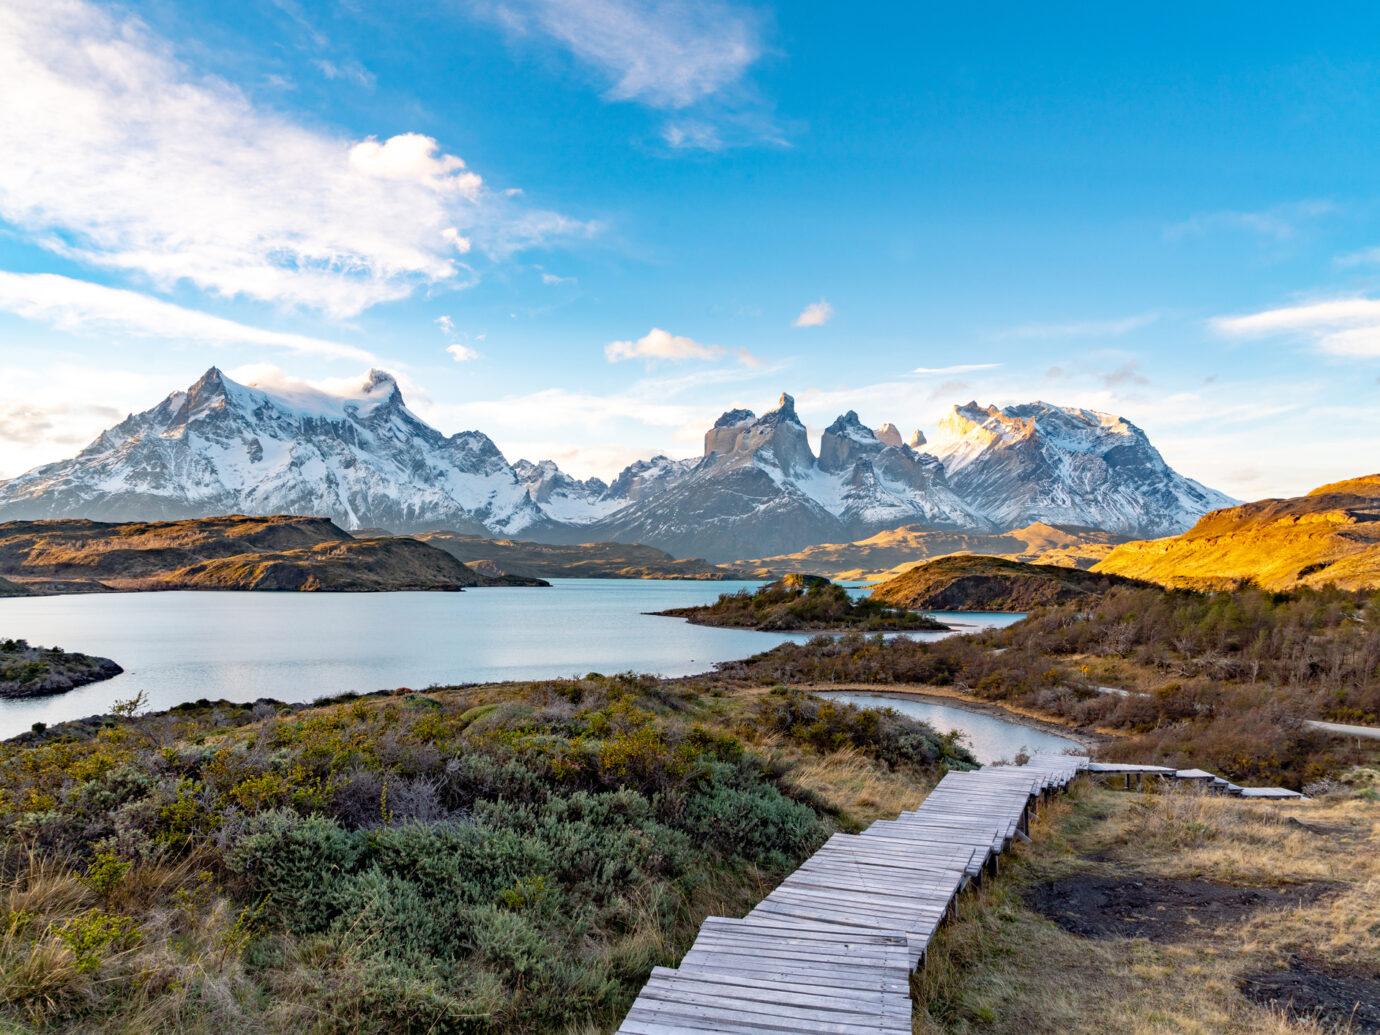 Torres del Paine National Park,Chile